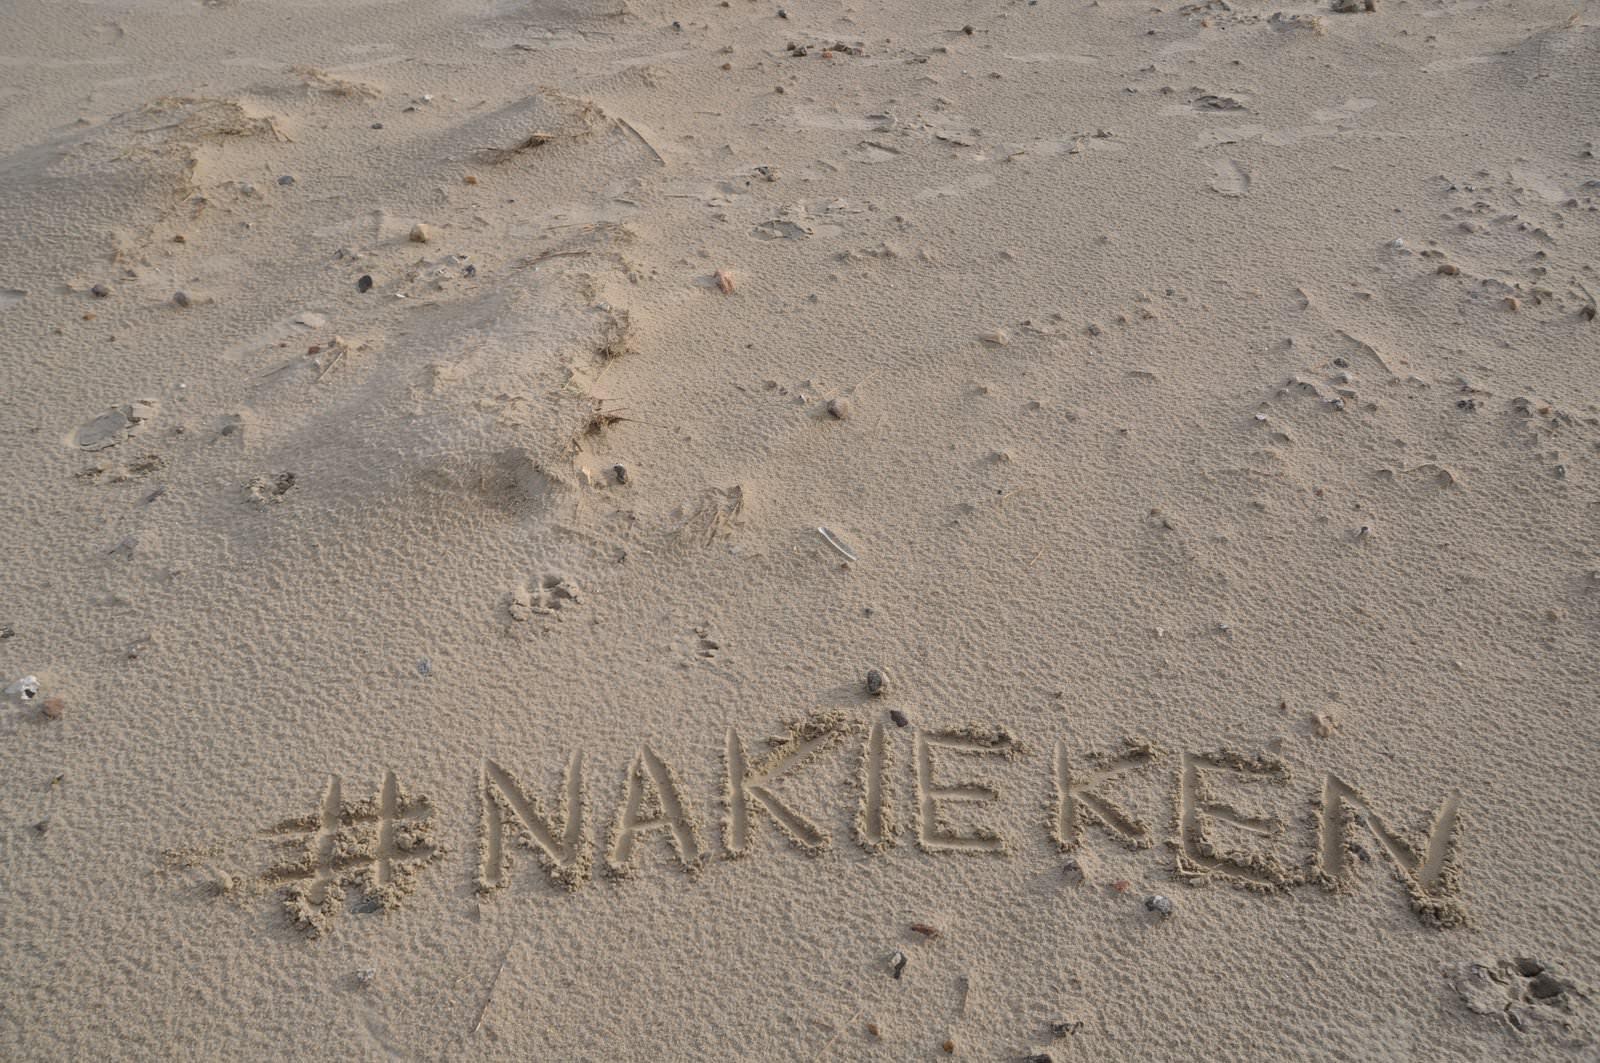 Nakieken im Sand